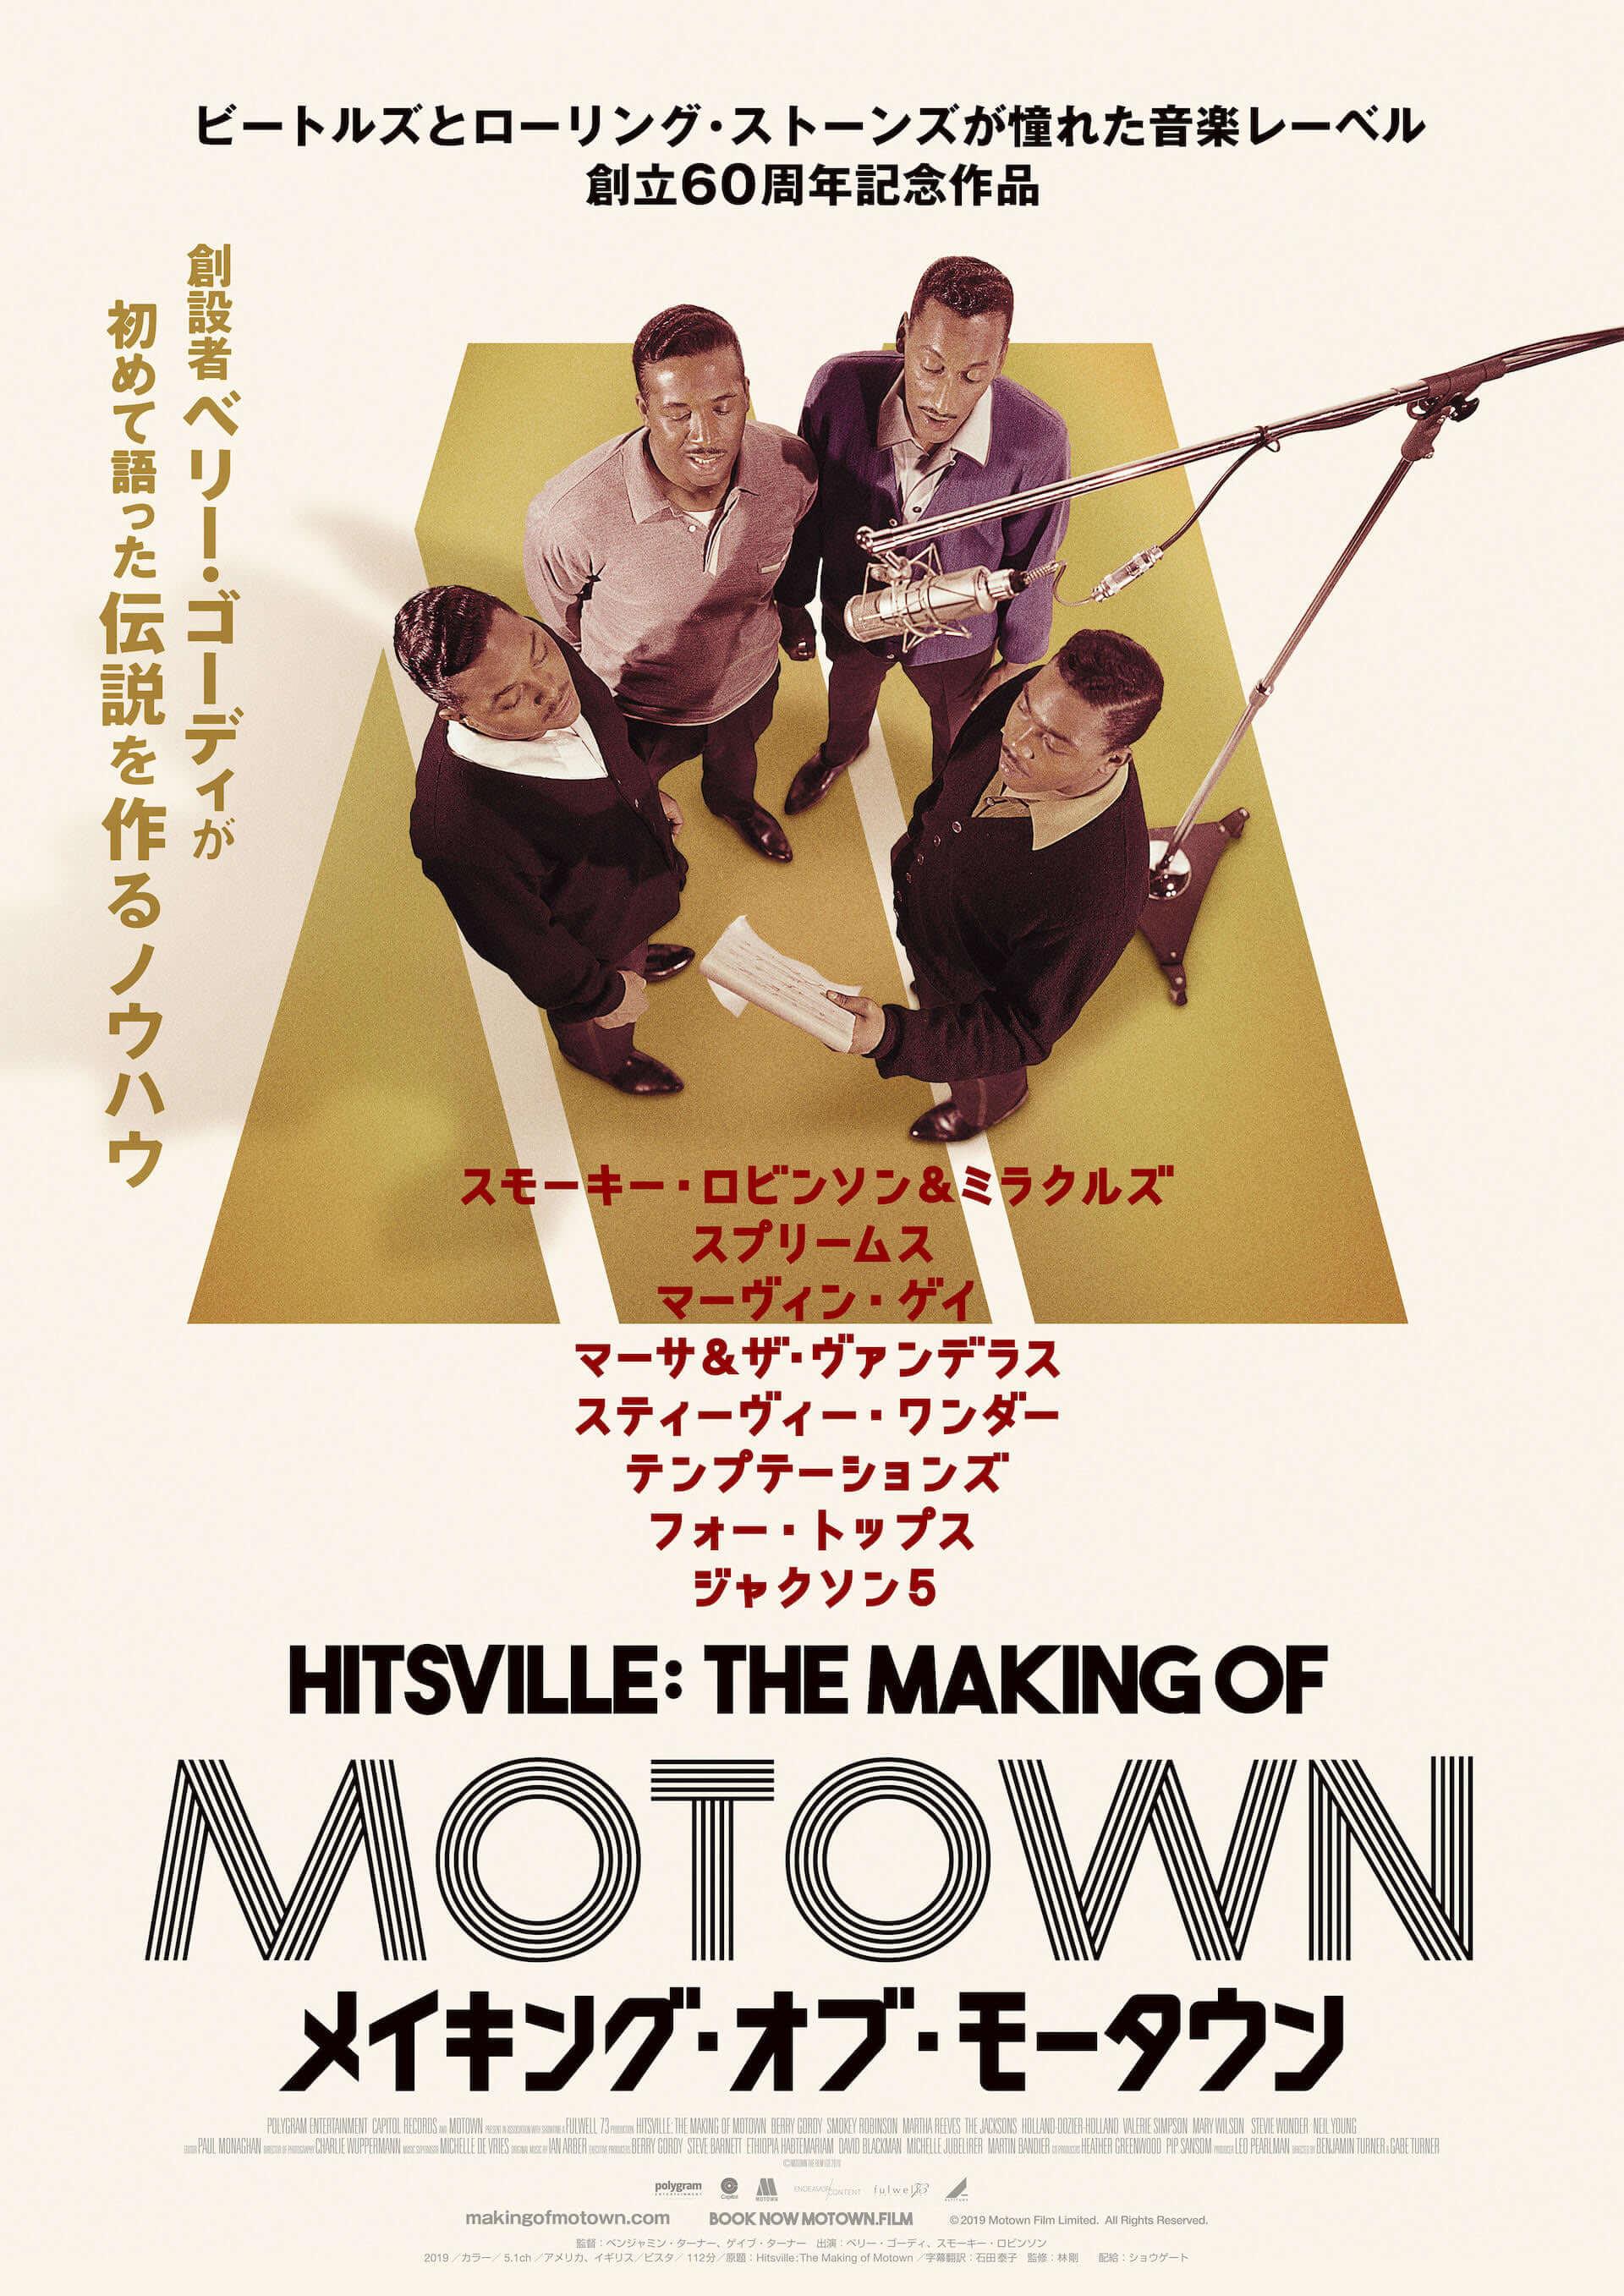 Marvin GayeやStevie Wonderを輩出した〈モータウン〉の軌跡がドキュメンタリー映画に!『メイキング・オブ・モータウン』が日本公開決定 film200625_makingofmotown_1-1920x2715